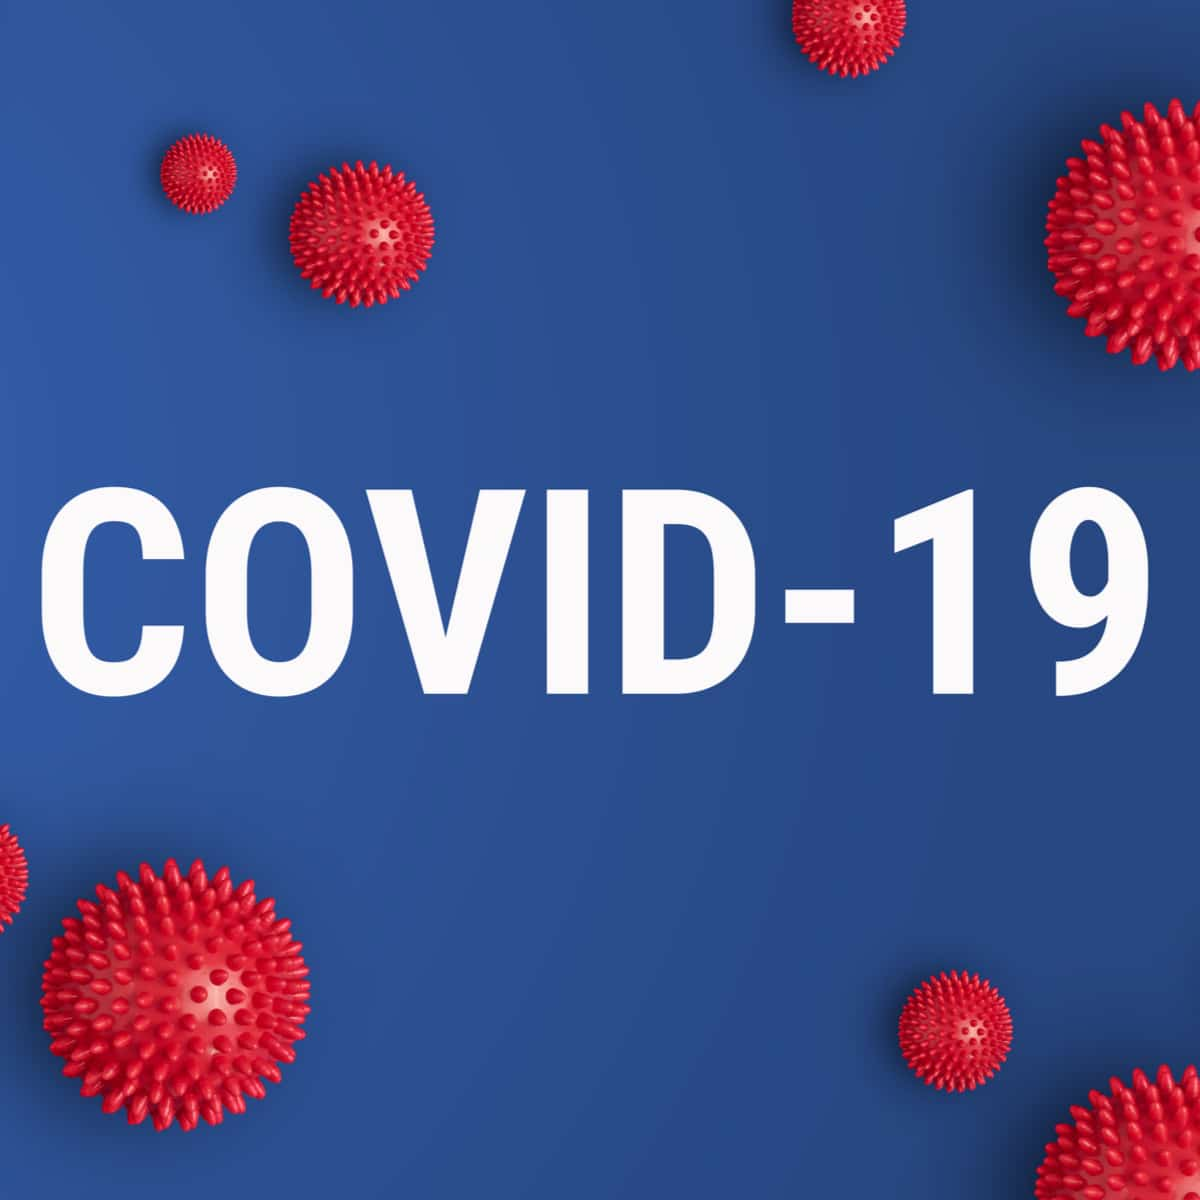 AZILITY'S response to COVID-19